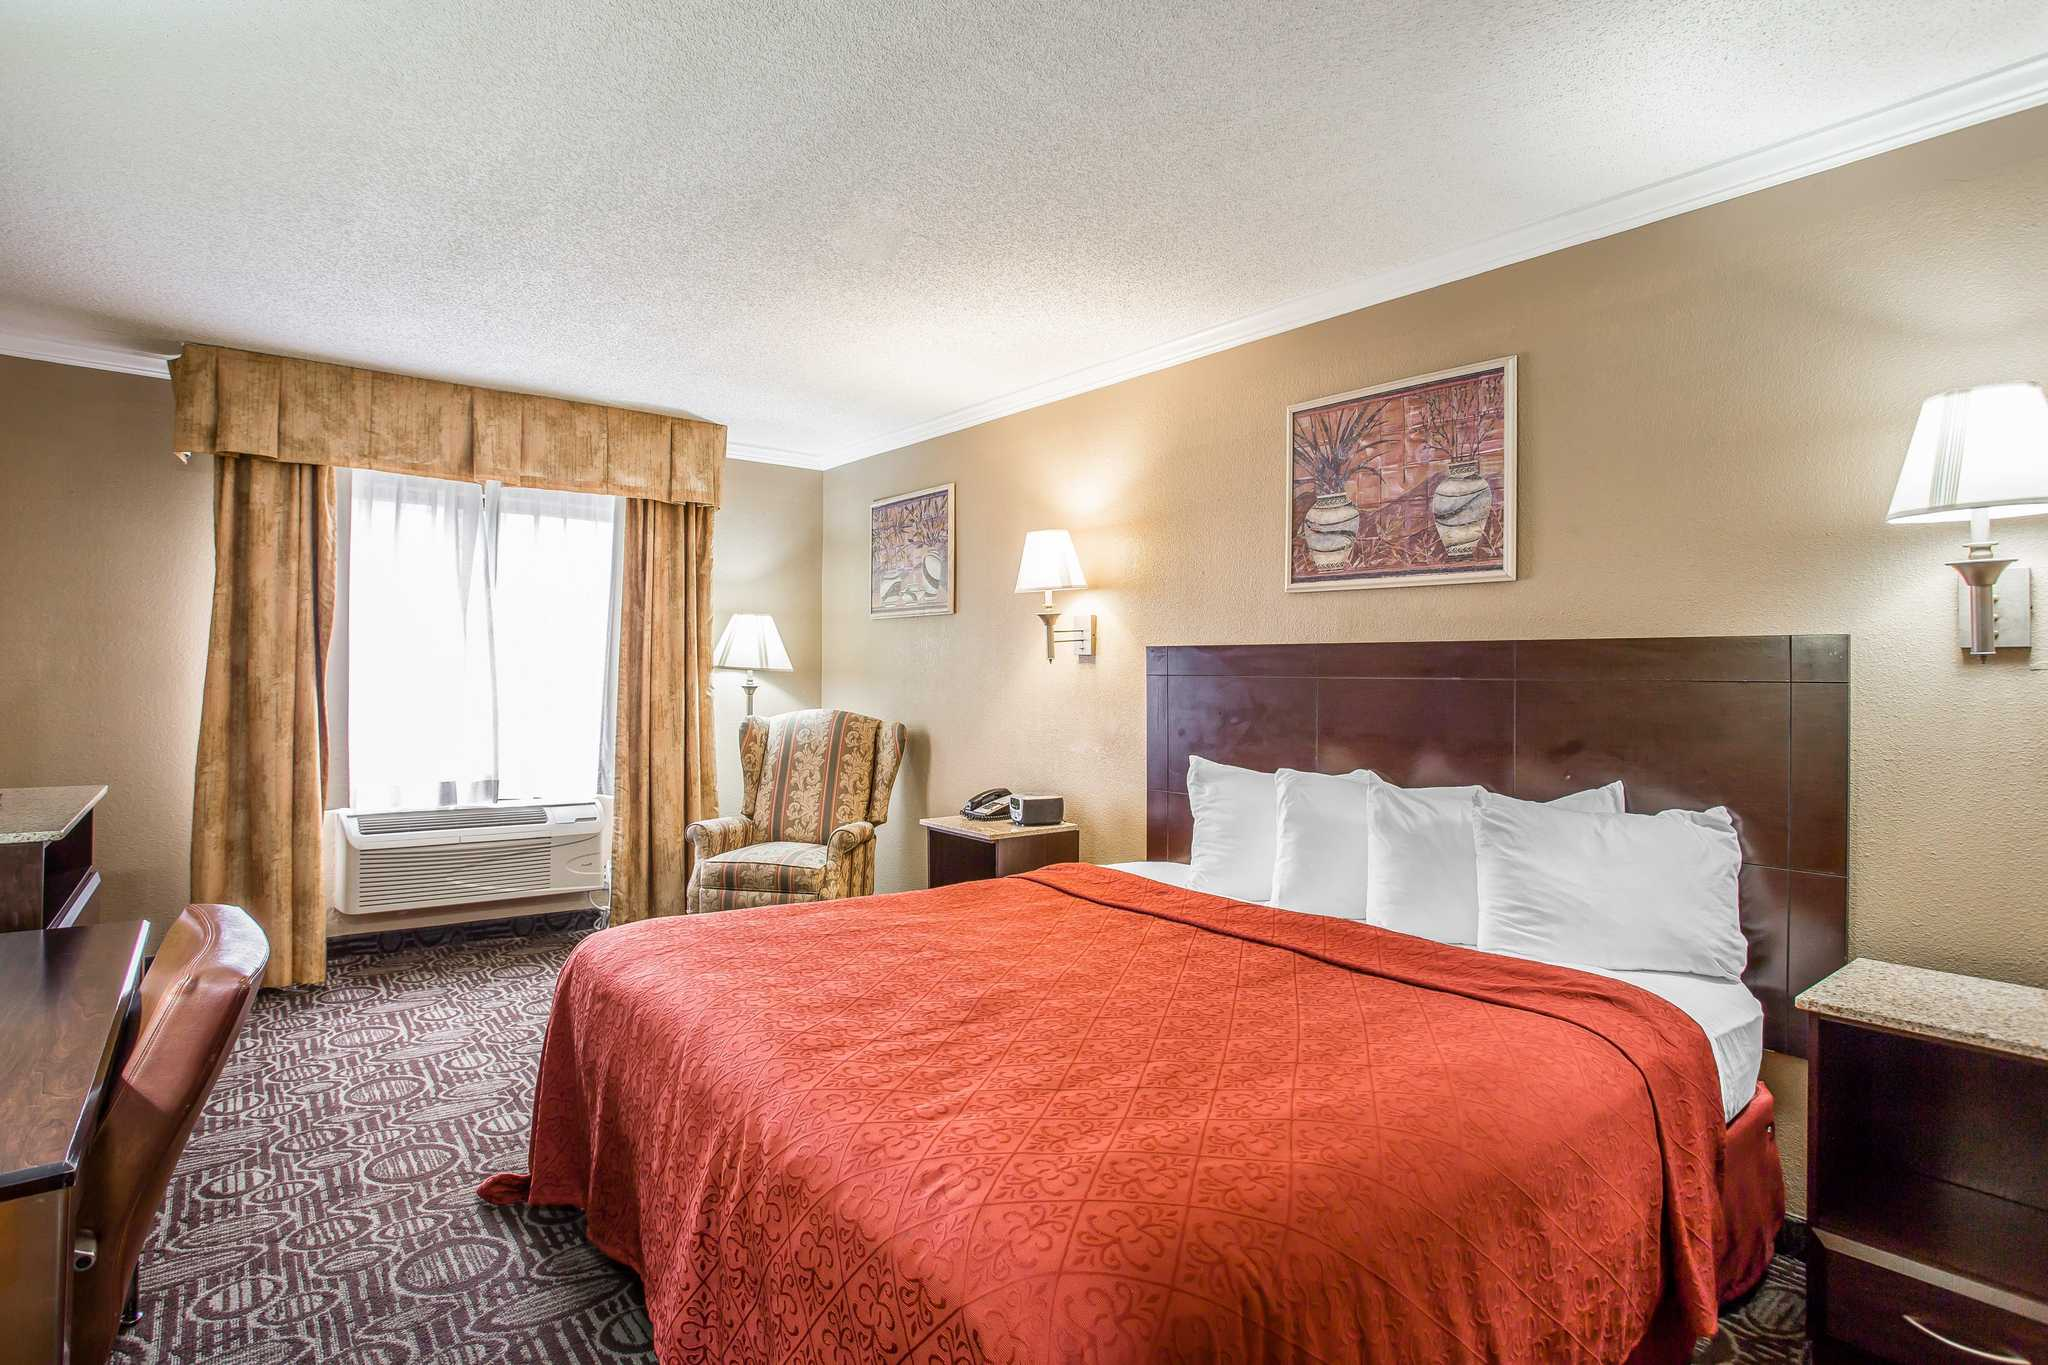 Quality Inn & Suites Ft. Jackson Maingate image 4